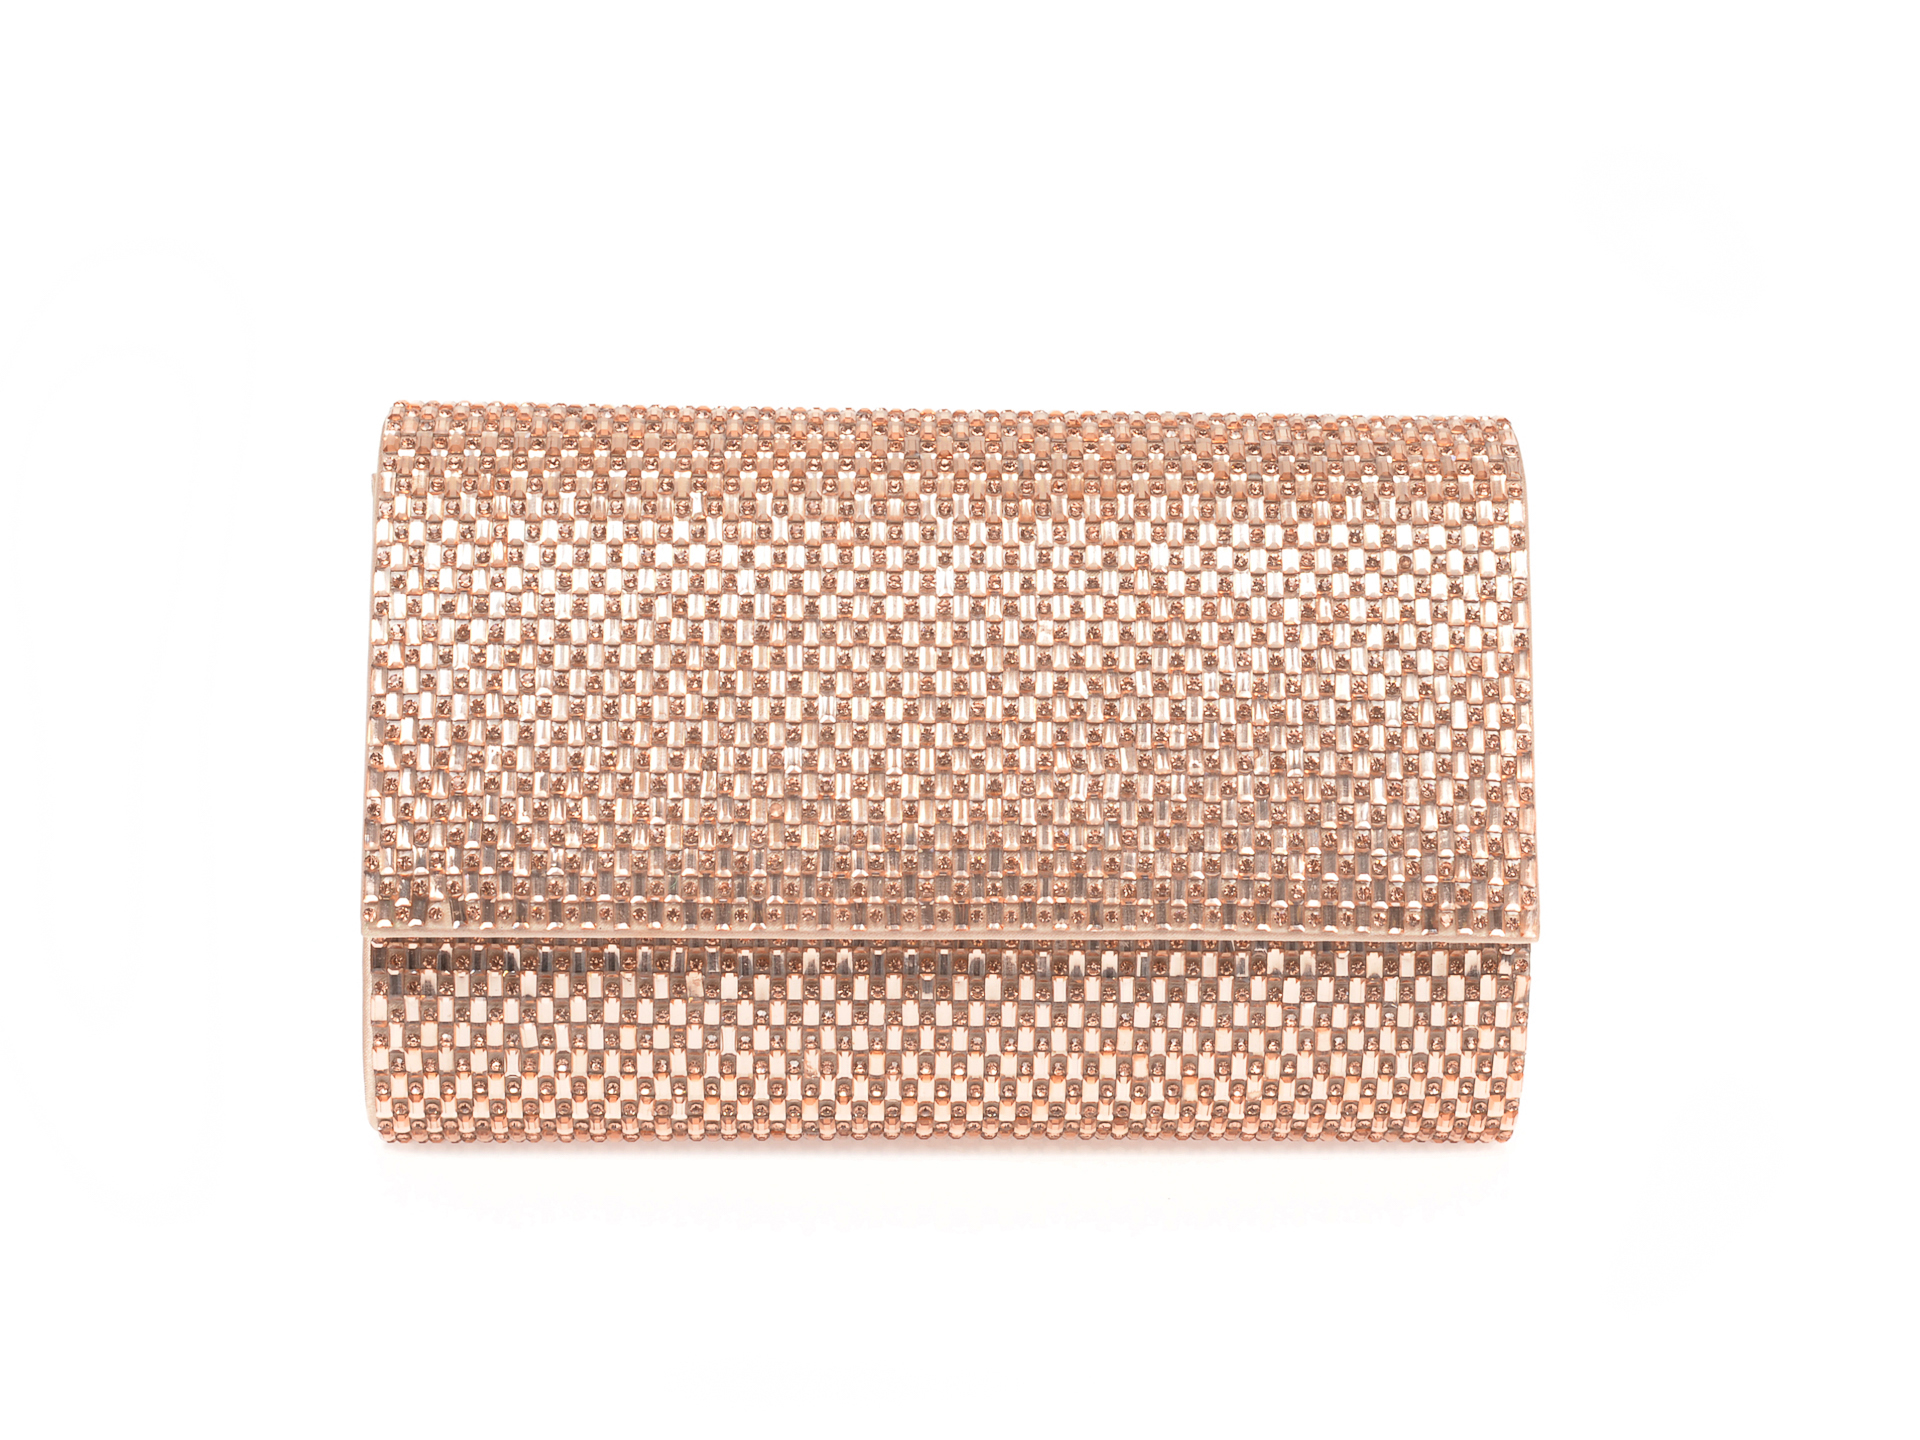 Poseta plic ALDO aurie, Peleaga710, din material textil New